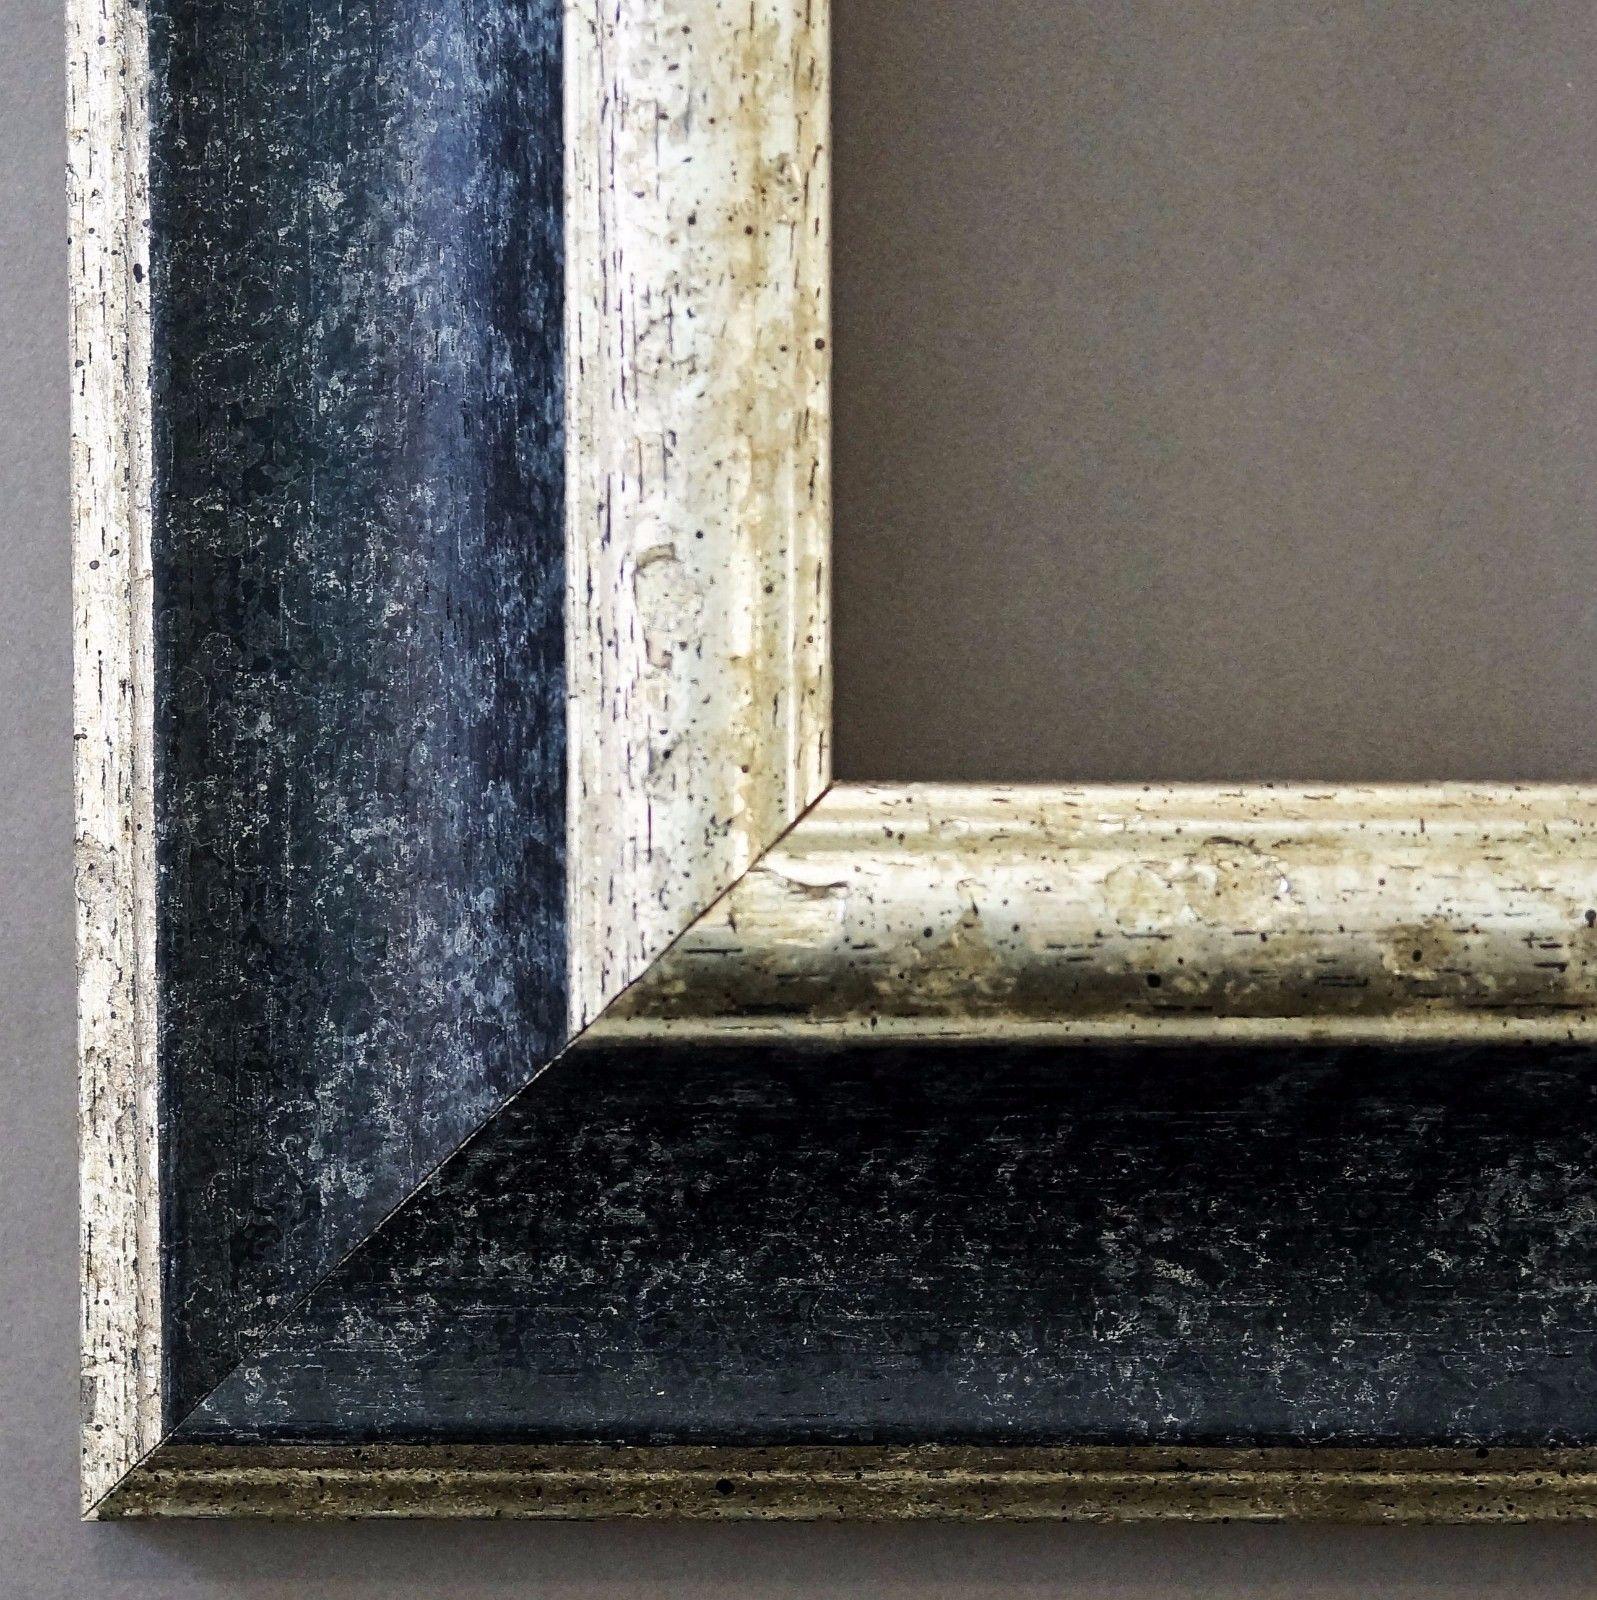 bilderrahmen schwarz silber antik barock fotorahmen urkunde rahmen holz acta 6 6 kaufen bei. Black Bedroom Furniture Sets. Home Design Ideas